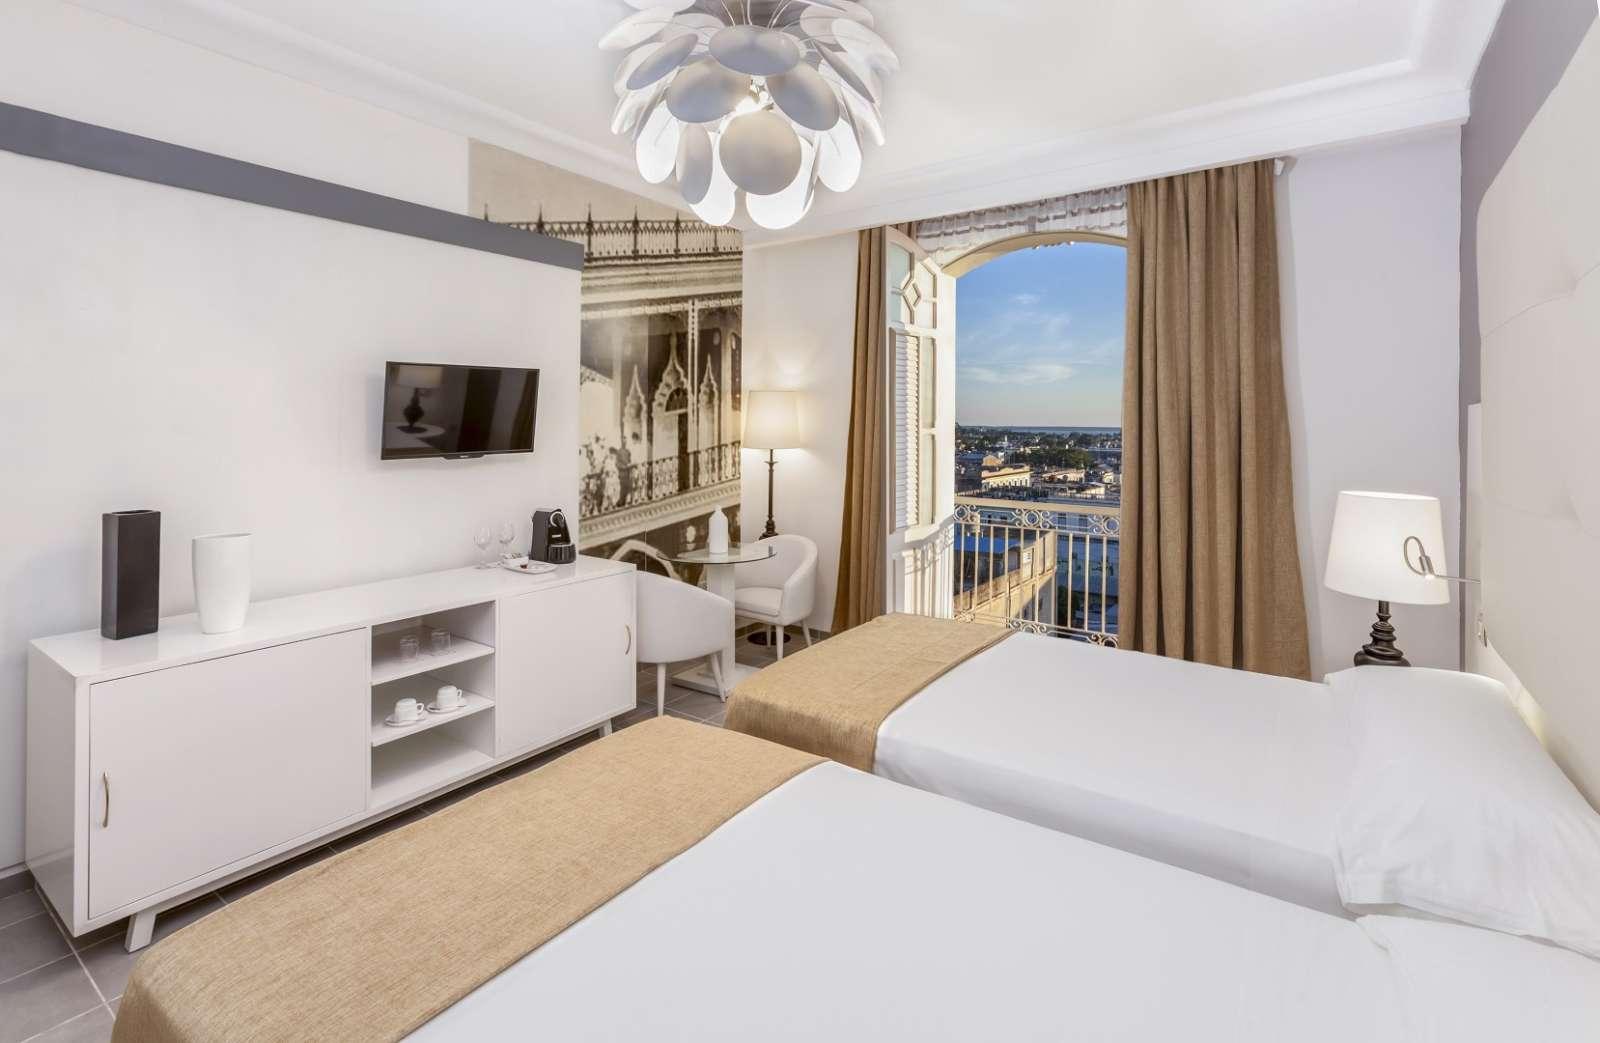 Twin room with view at Melia San Carlos